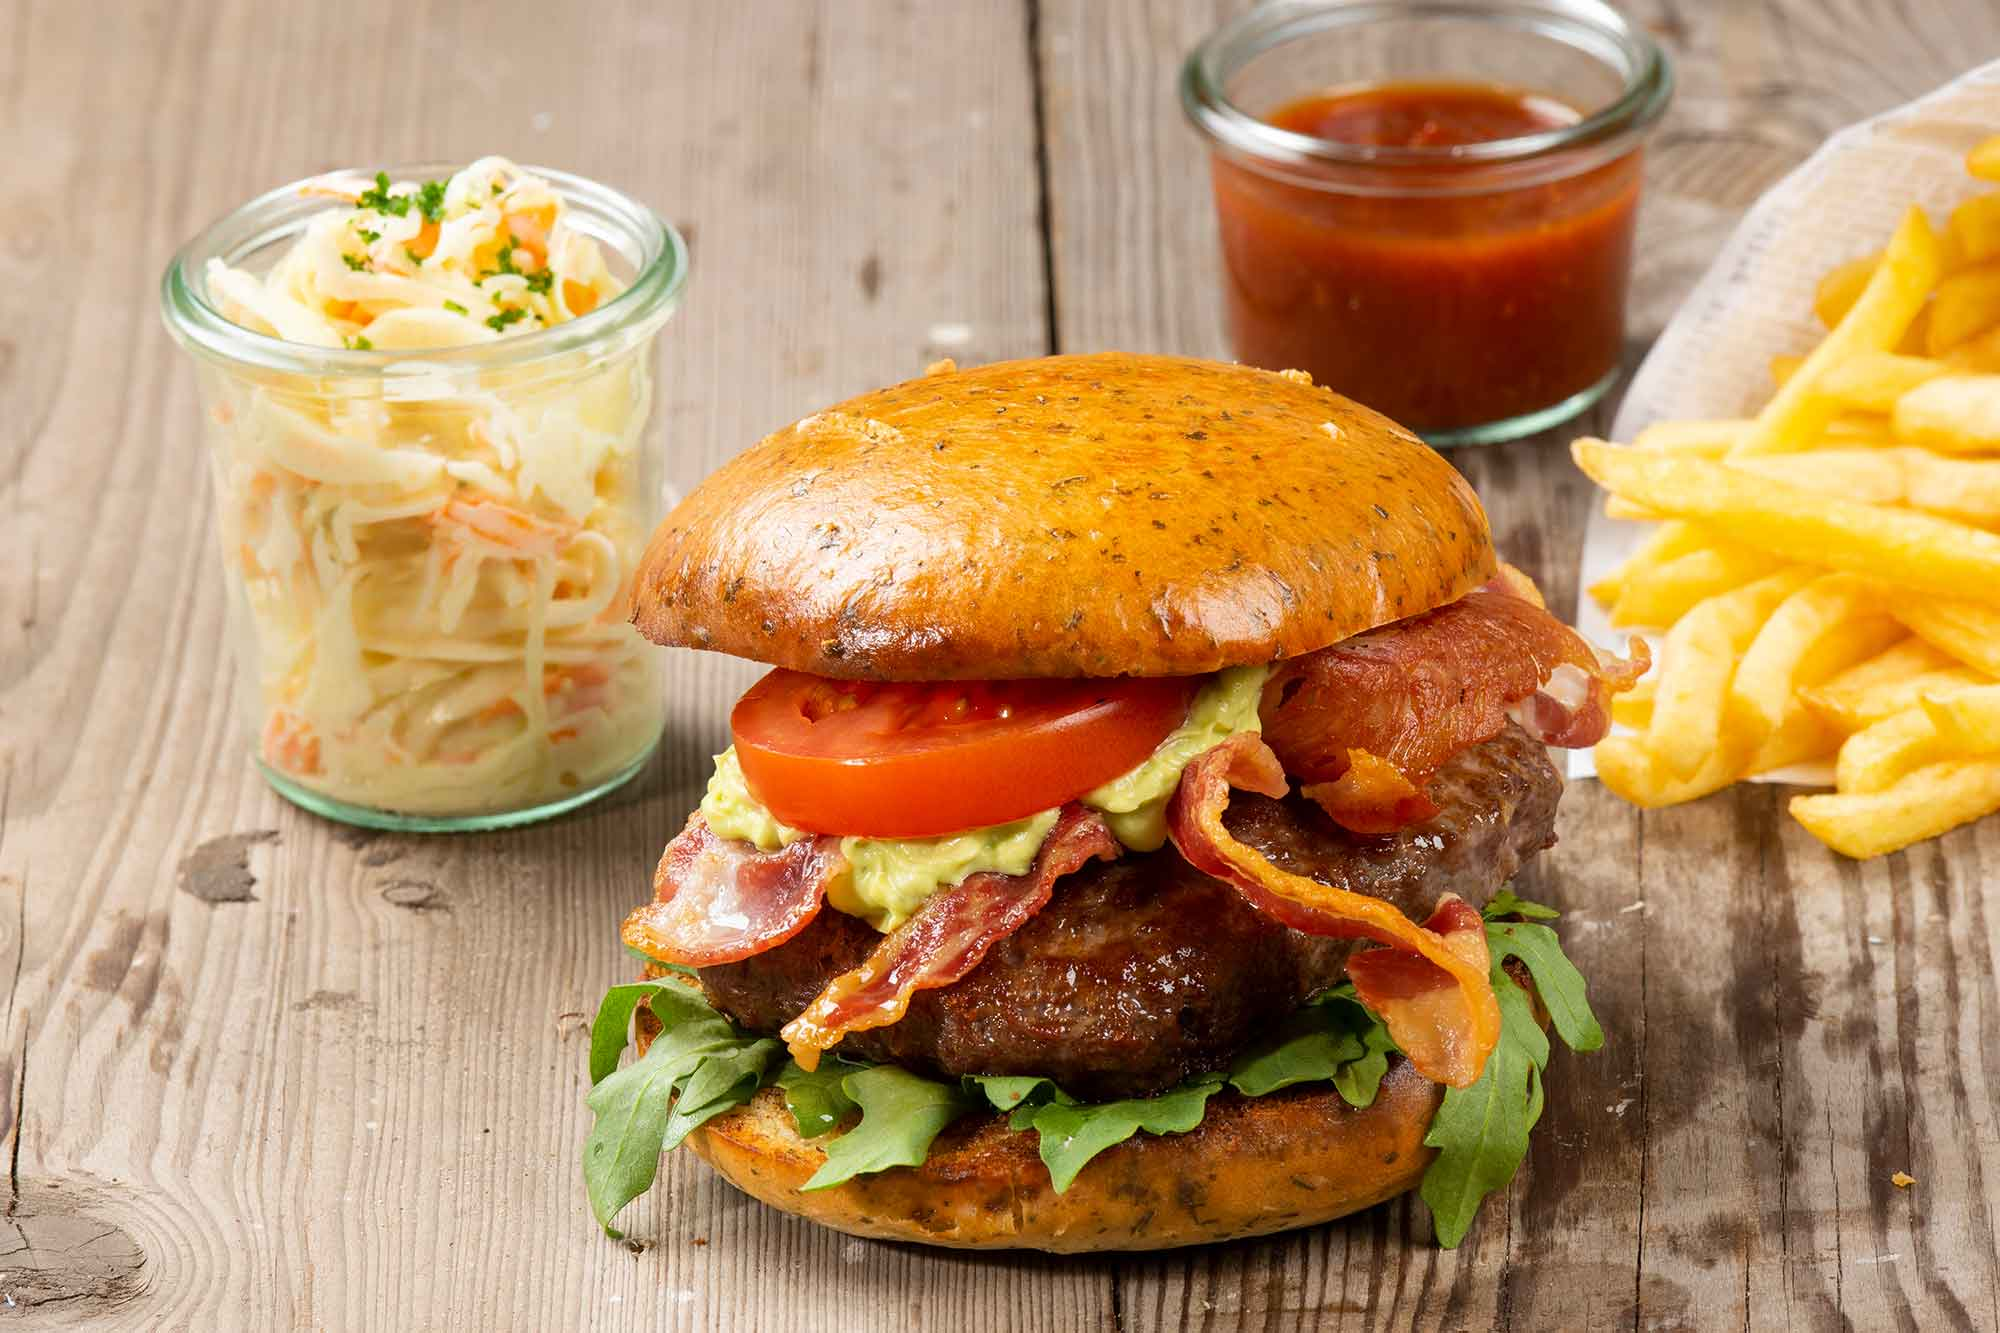 California Burger - Brioche, 200g Rindfleisch, Avocado Creme, getrocknete Tomate, Rucola, Bacon